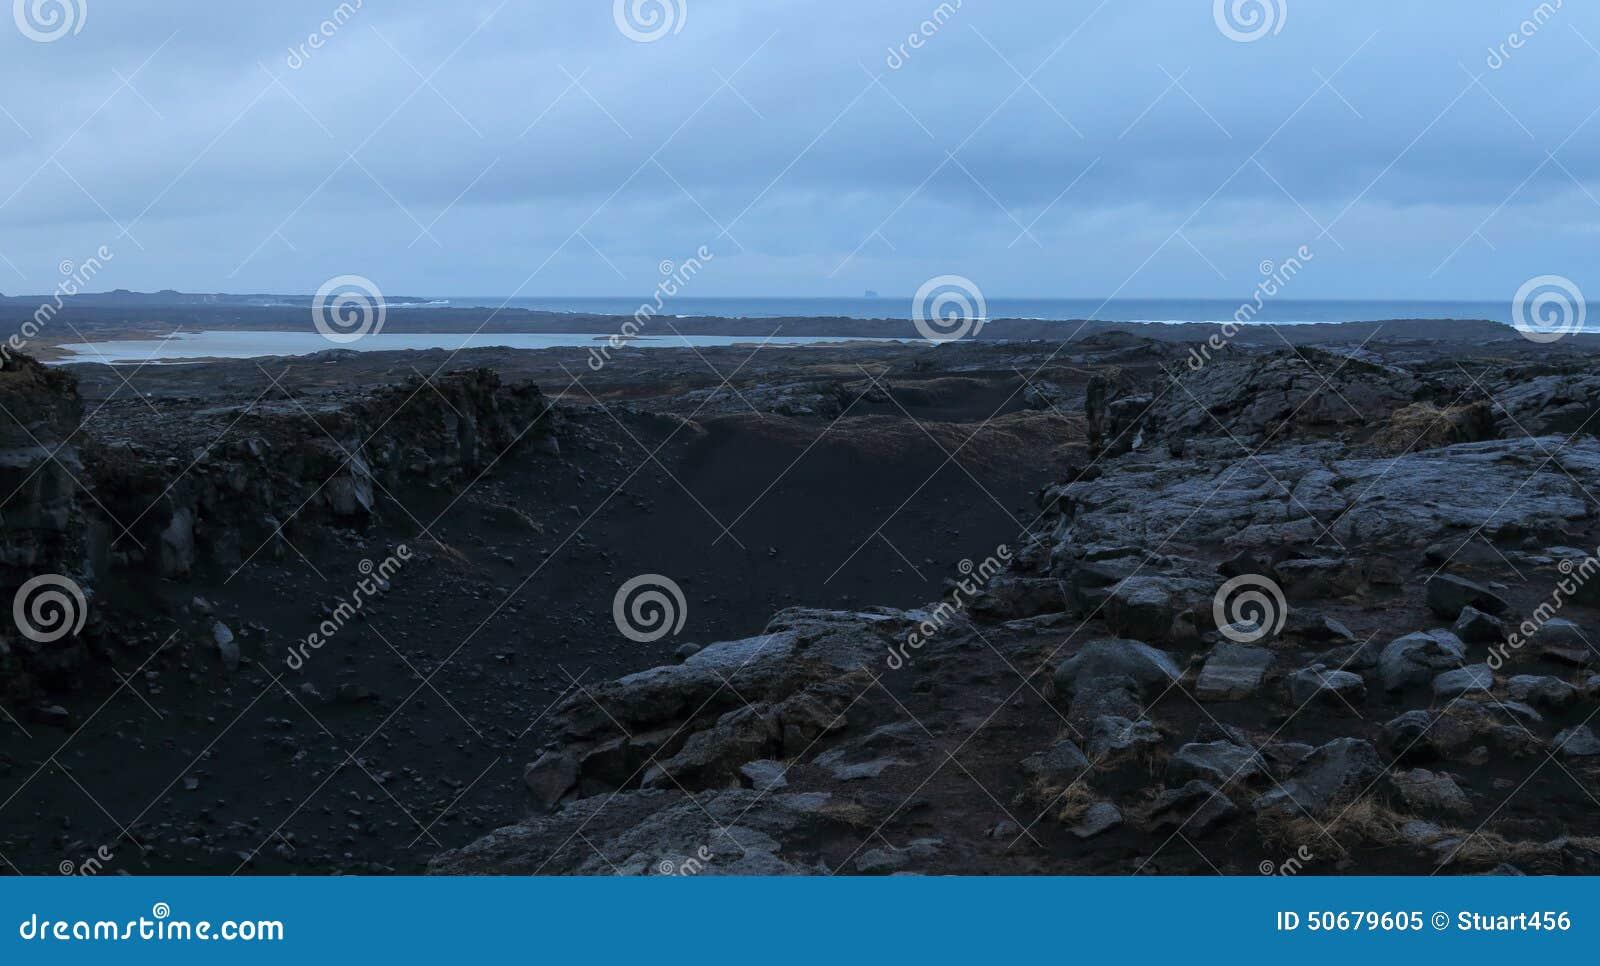 Download 在大陆之间的桥梁,冰岛 库存图片. 图片 包括有 beauvoir, 北部, 裂口, 贿赂, 构造, 自然 - 50679605